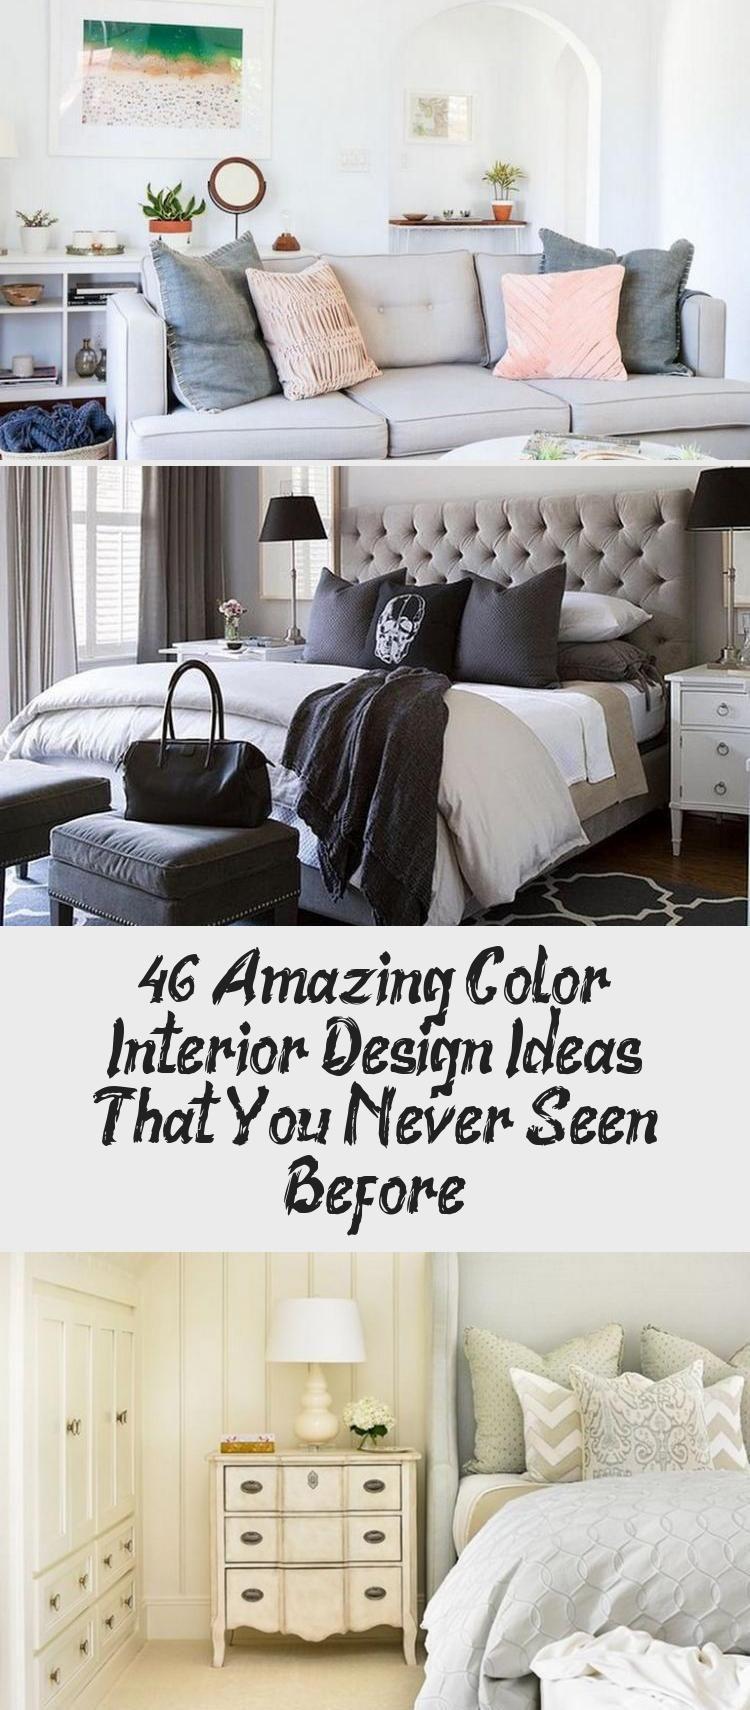 46+ Amazing Color Interior Design Ideas That You Never Seen Before #interiordesign #interiordesignideas #interiordecorating #interiordesignConcept #interiordesignPlants #Traditionalinteriordesign #interiordesignApartment #interiordesignSchool